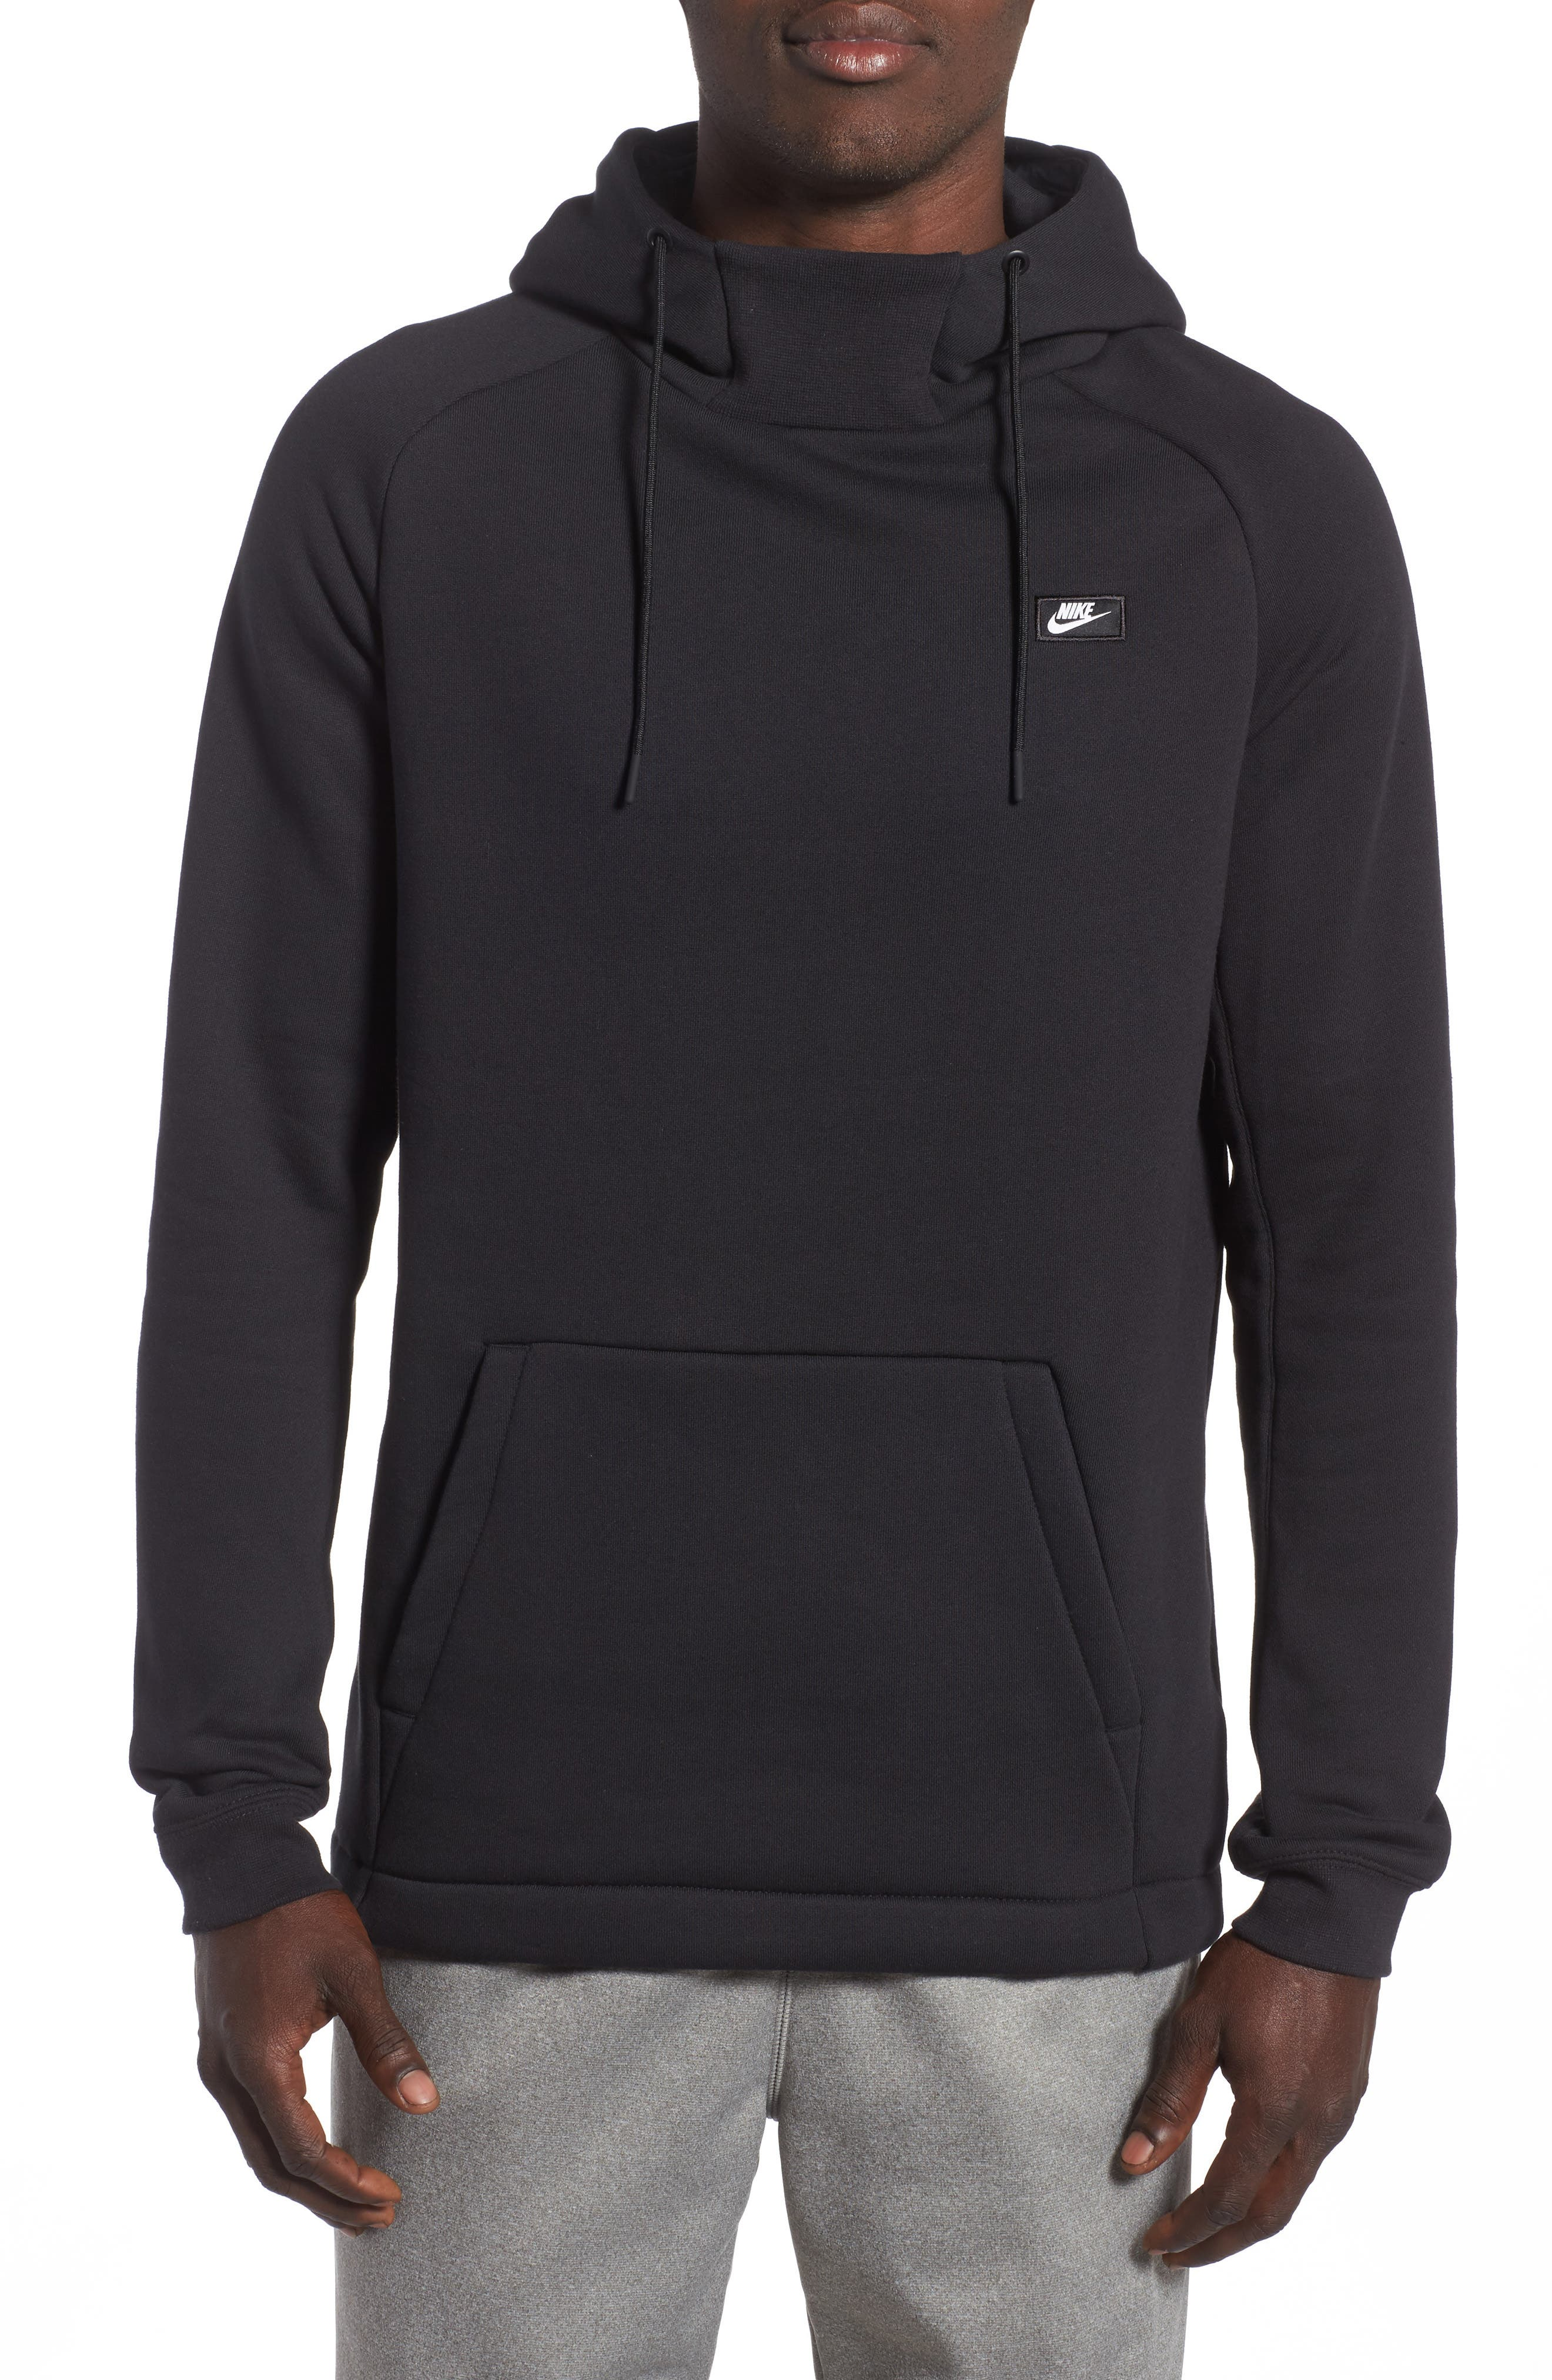 black nike sweatsuit